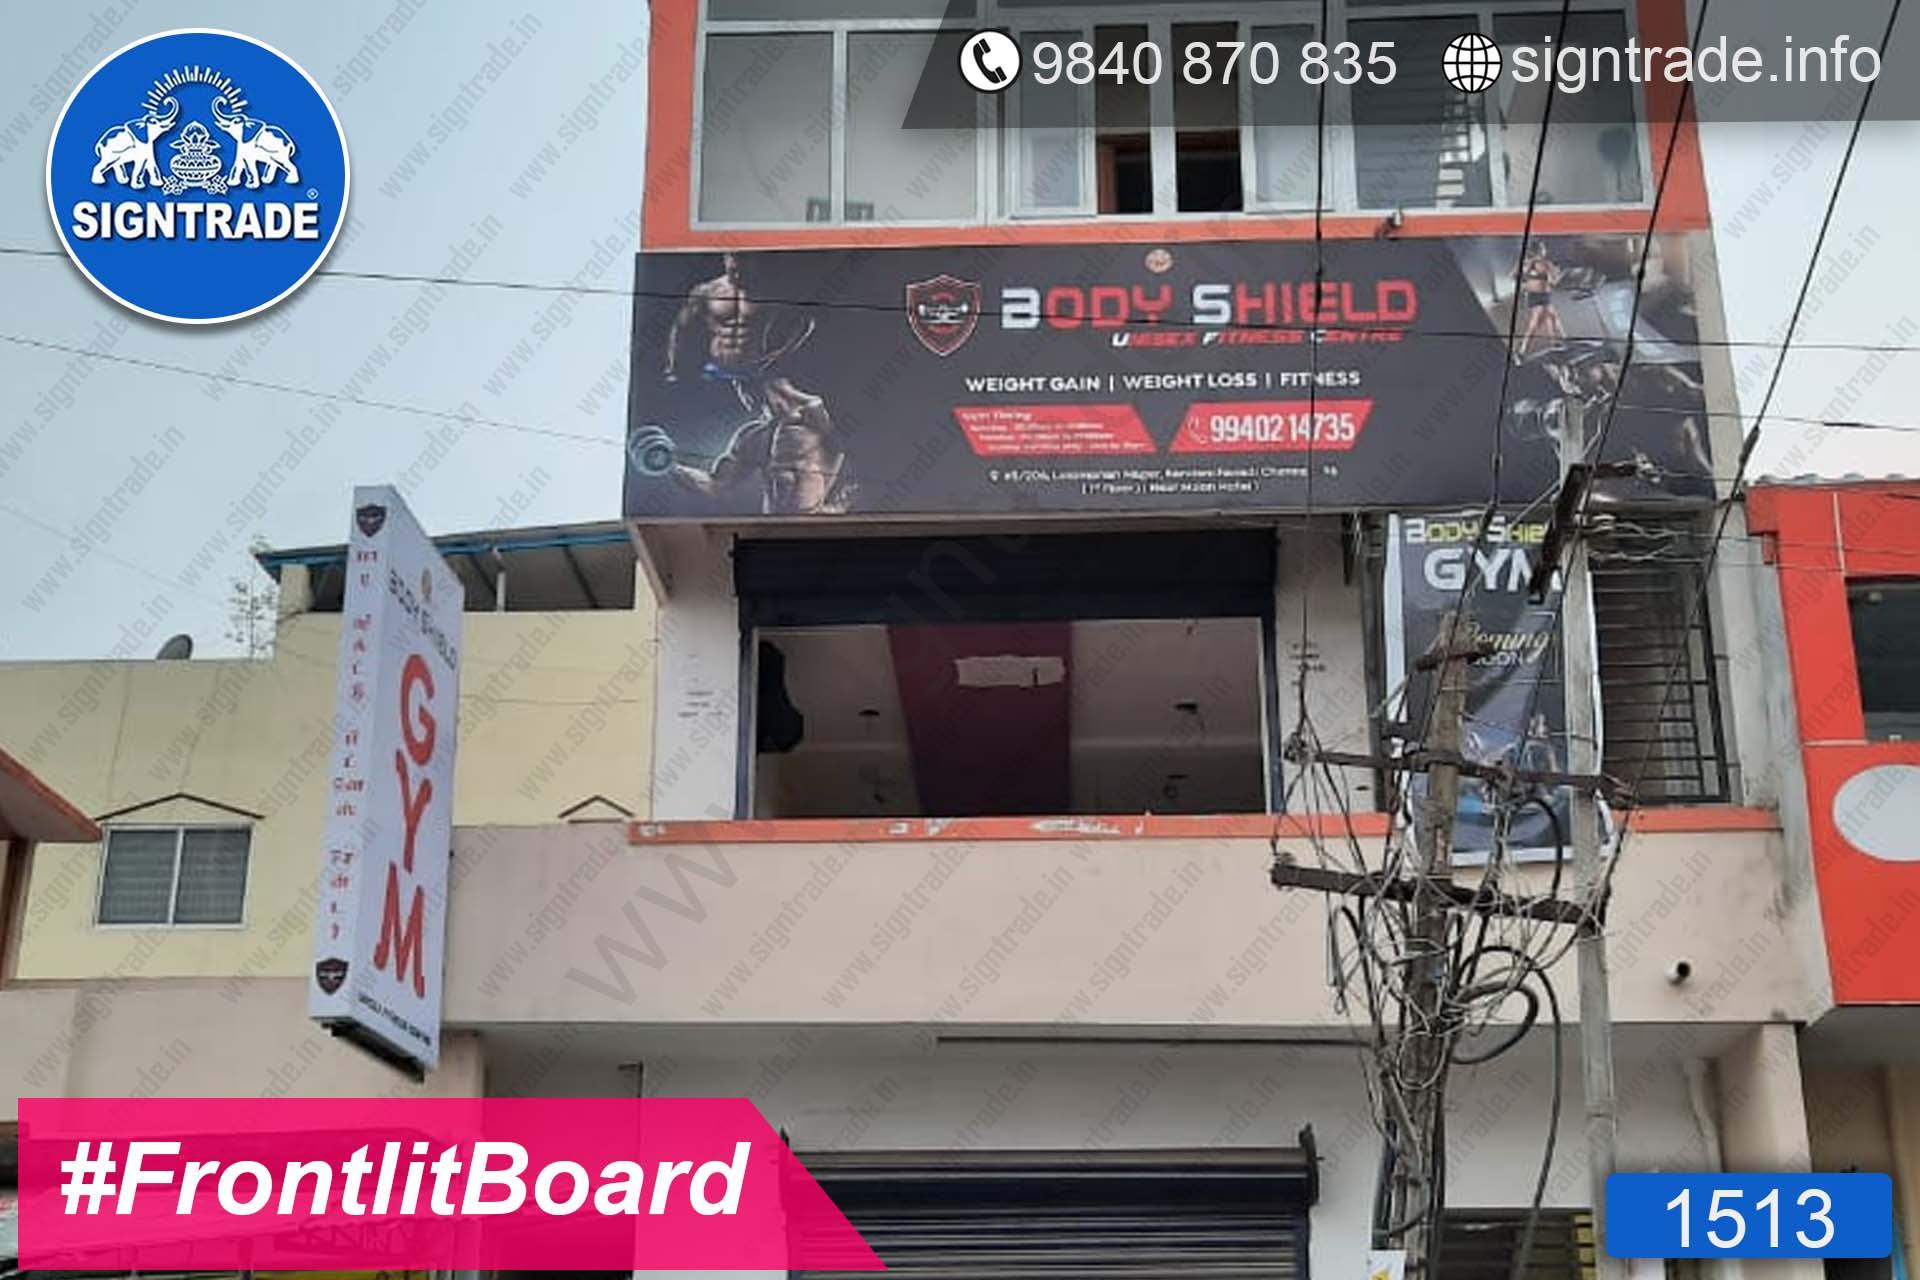 Body Shield Gym, Kandanchavadi, Chennai - SIGNTRADE - Digital Flex Printing Service - Frontlit Flex Board Manufacturers in Chennai